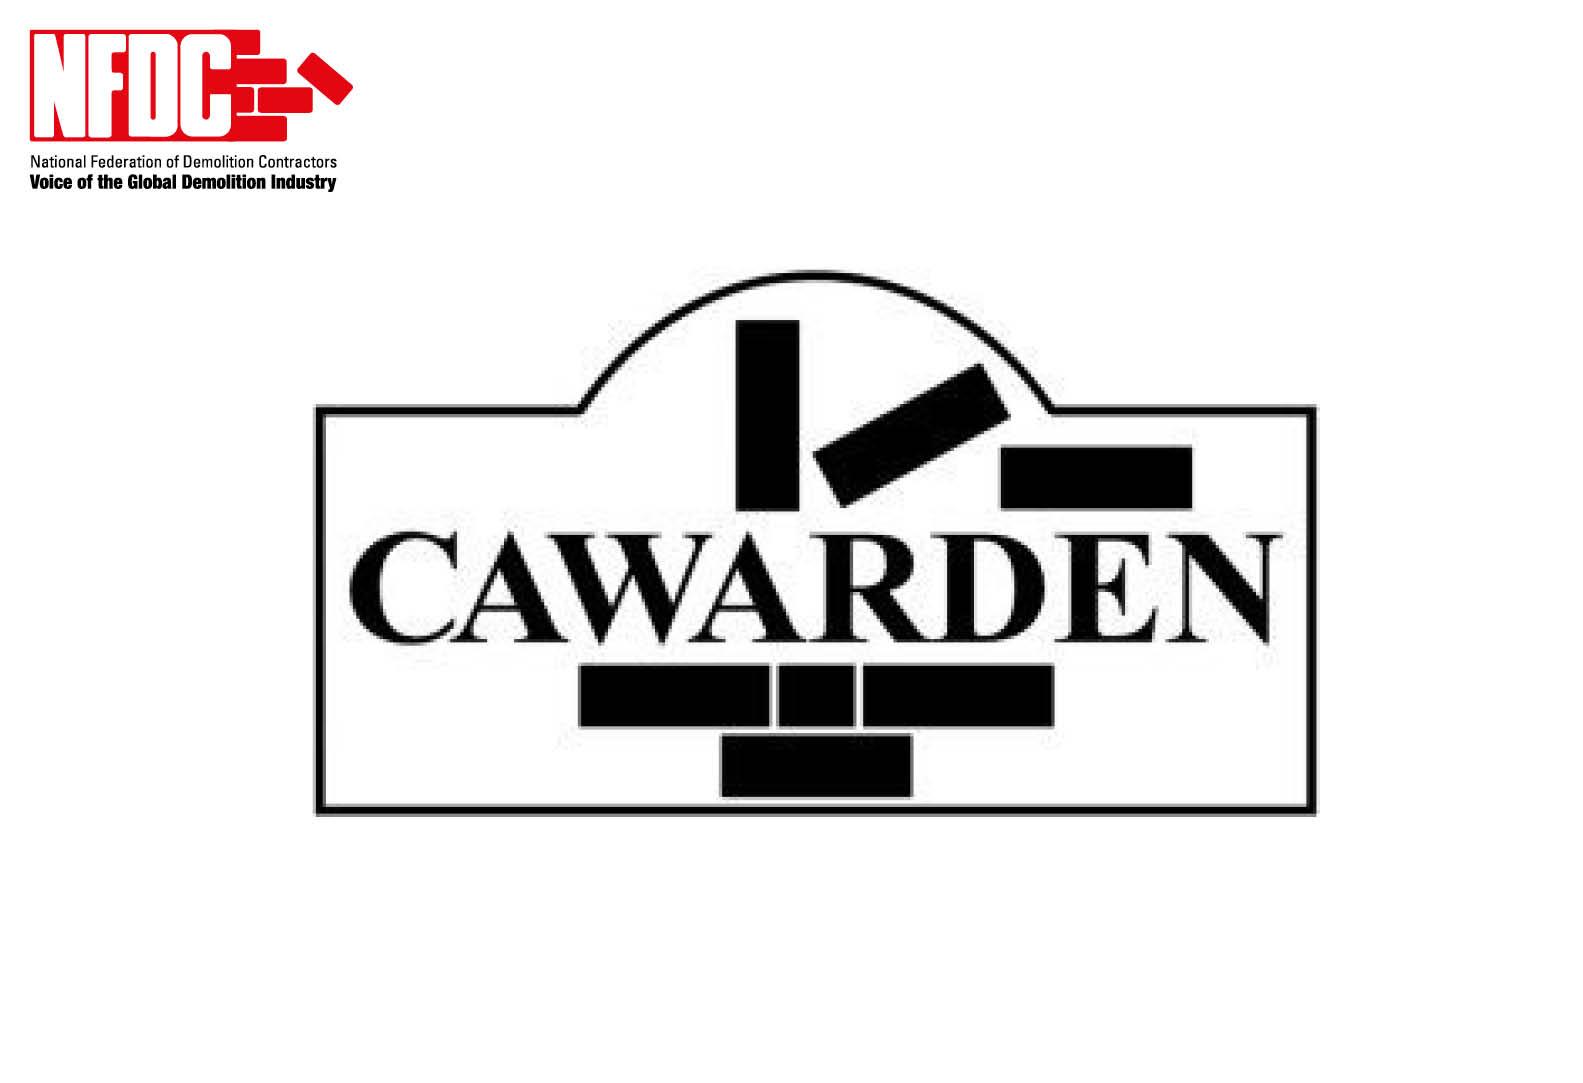 Cawarden